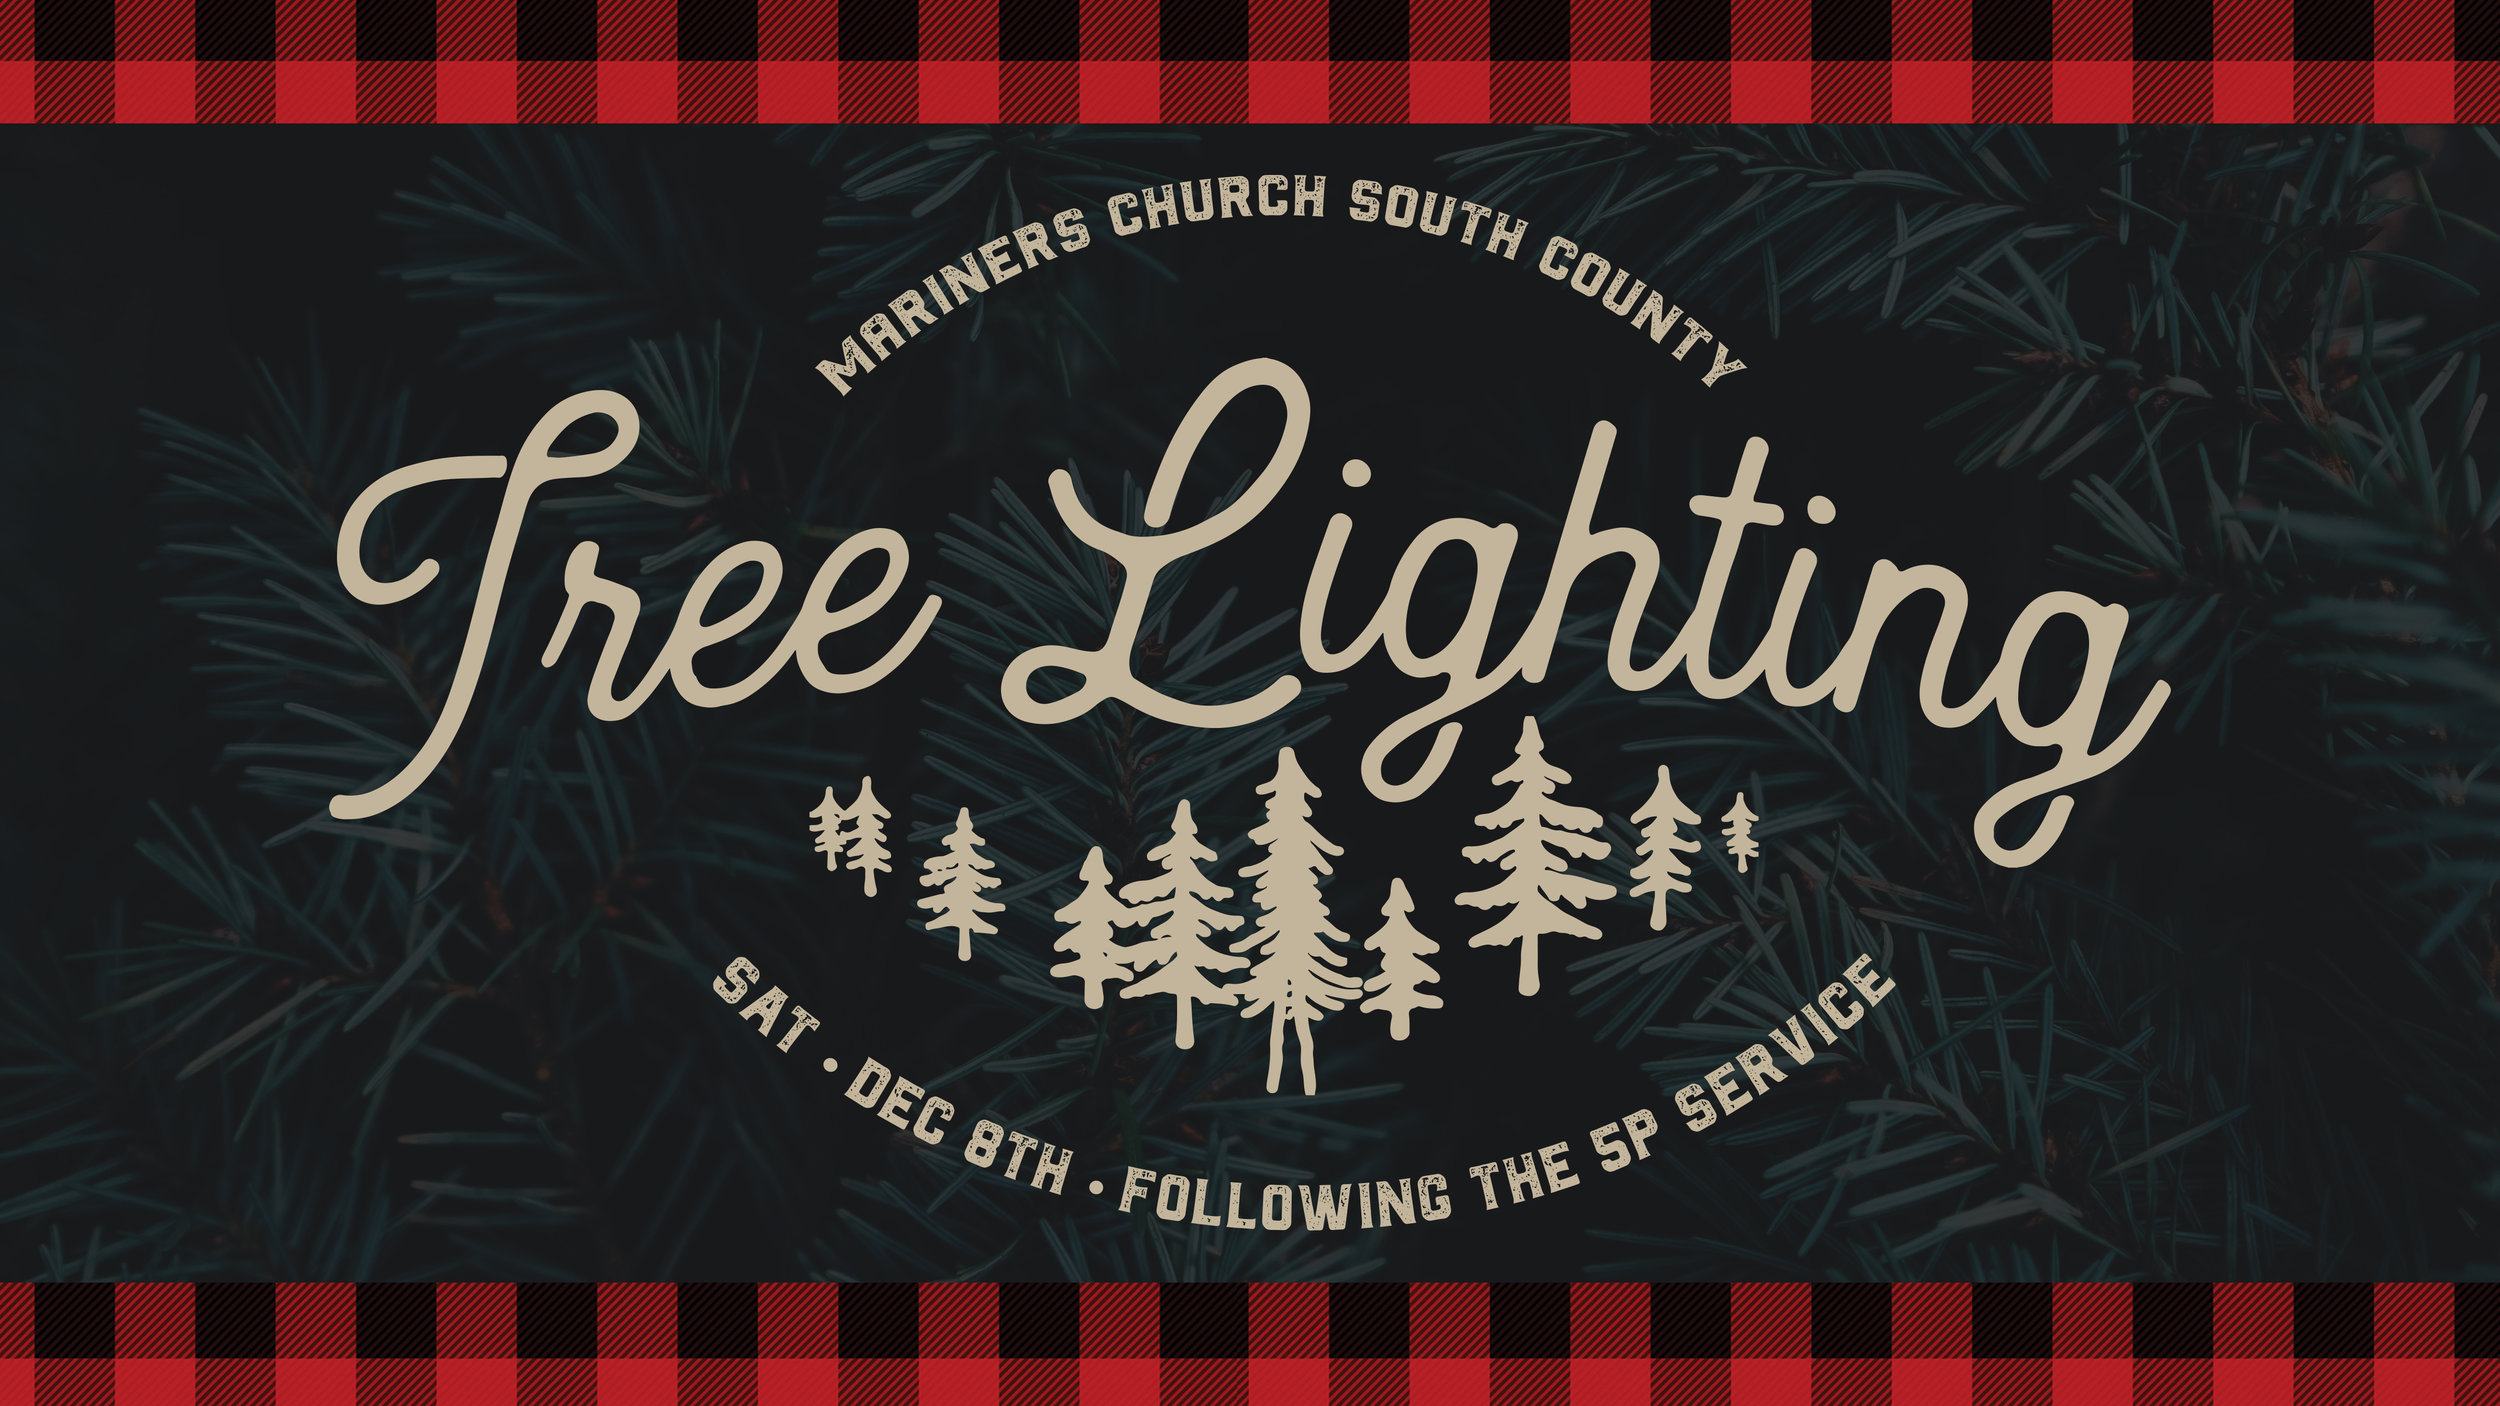 mcsc-tree-lighting-2018-1080p.jpg